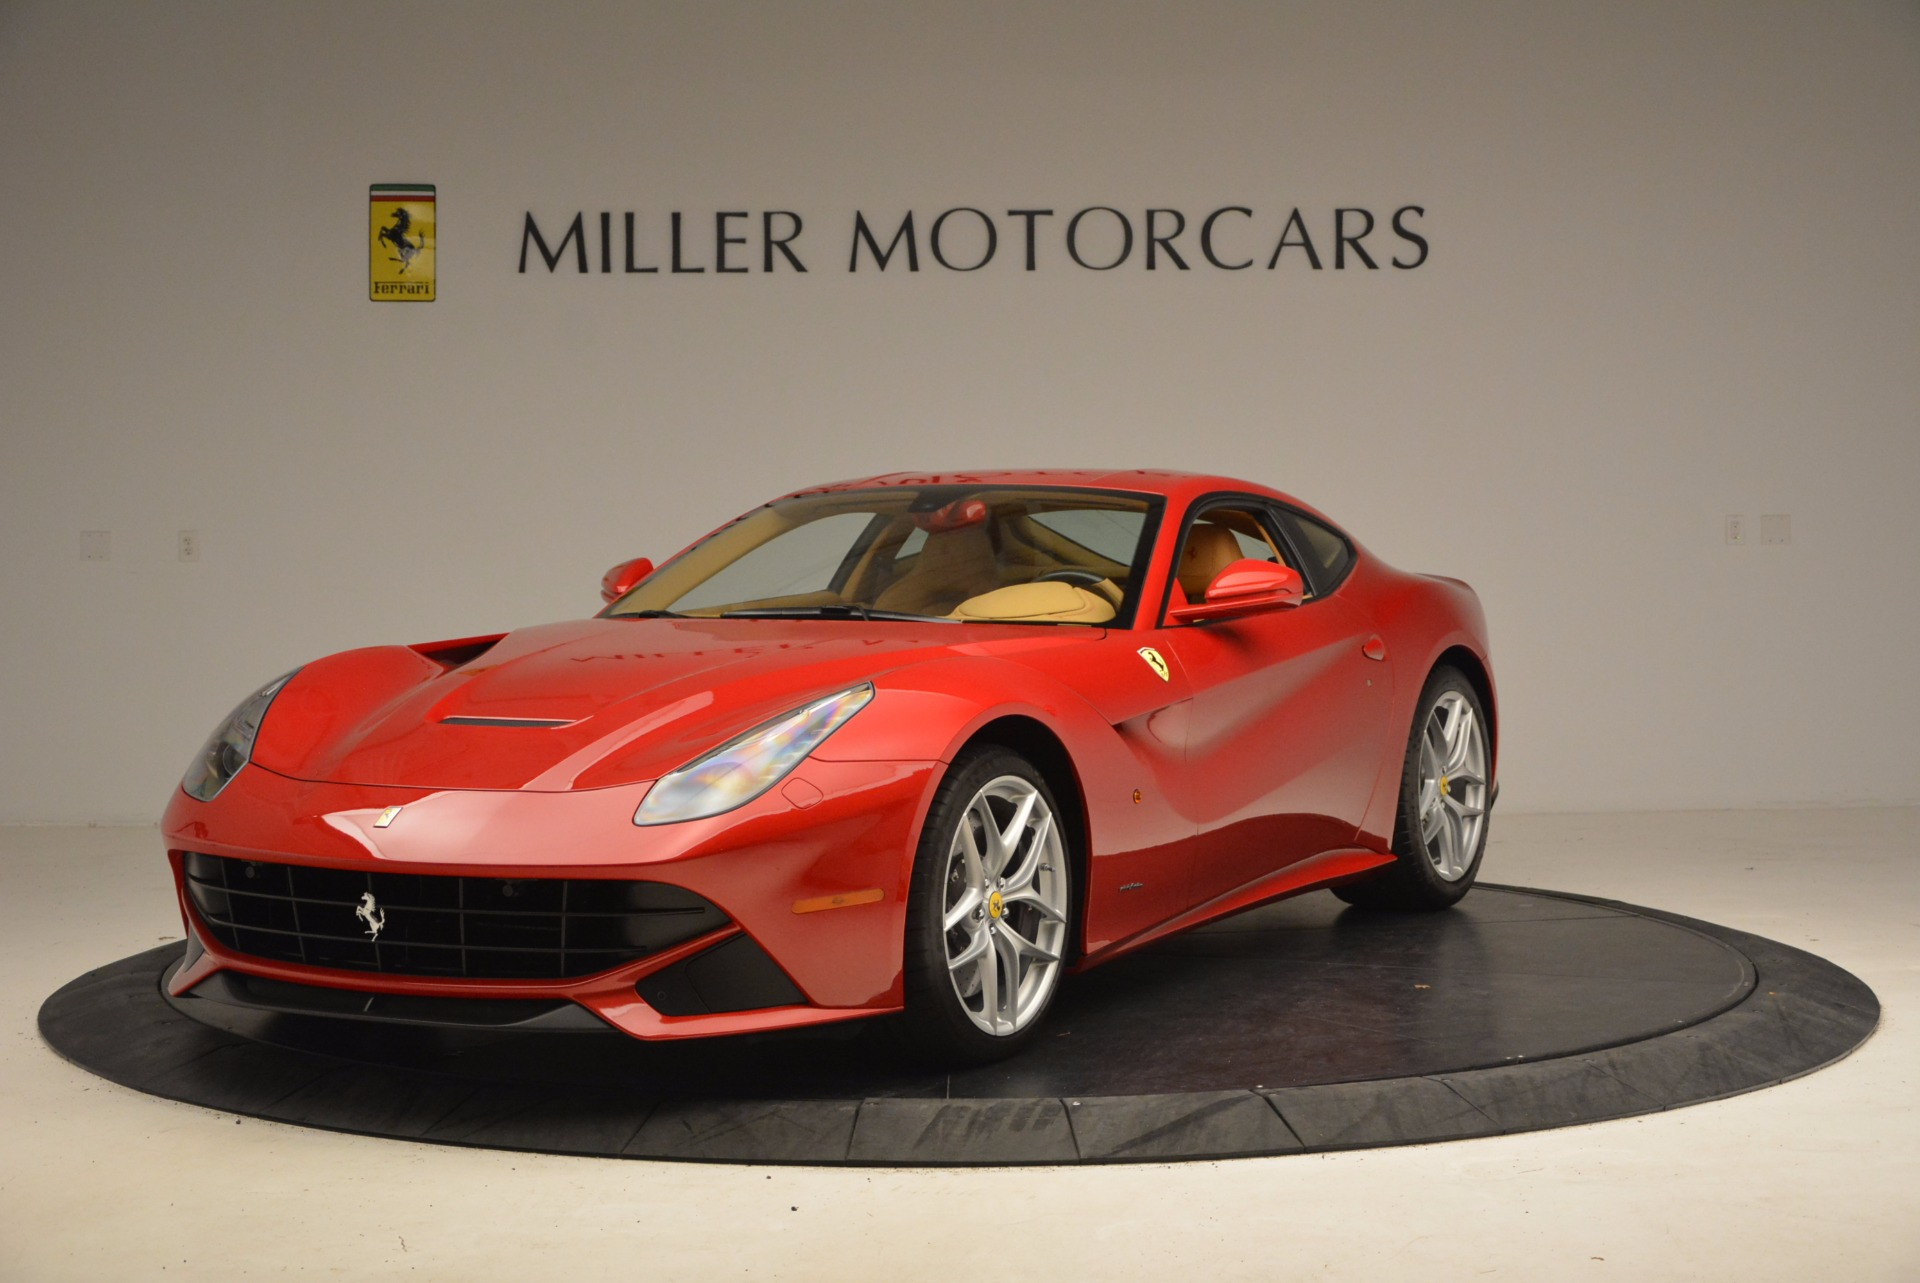 Used 2013 Ferrari F12 Berlinetta for sale Sold at Alfa Romeo of Greenwich in Greenwich CT 06830 1